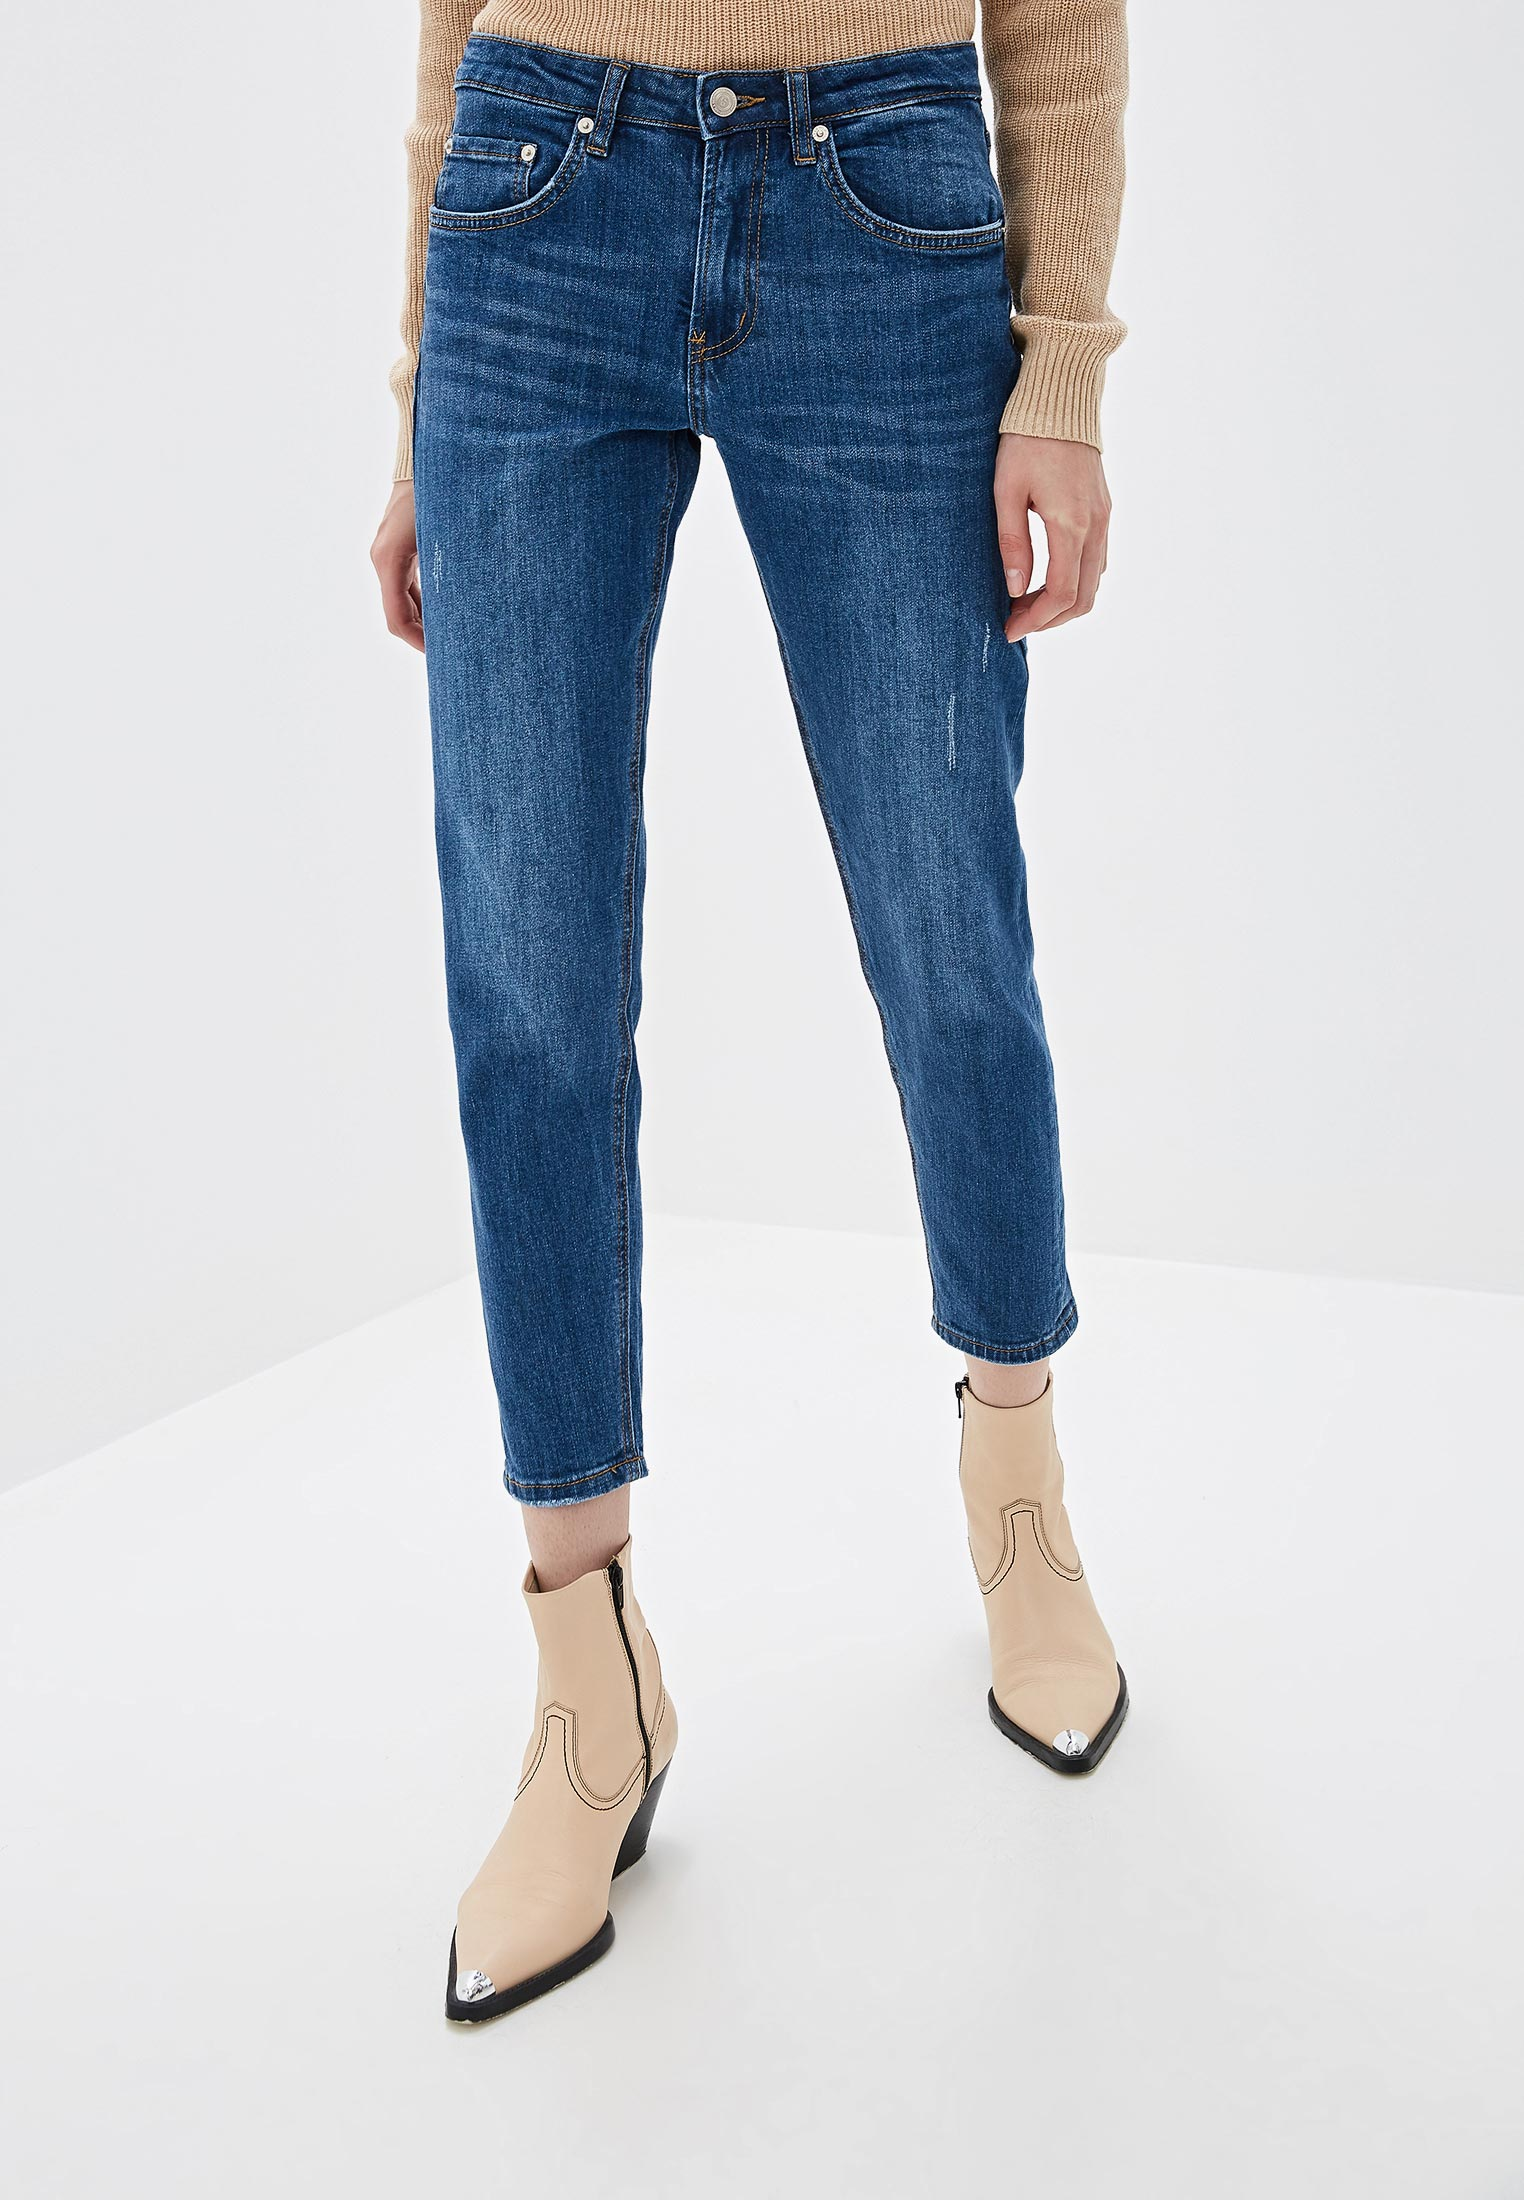 Зауженные джинсы Sela (Сэла) PJ-135/700-9391